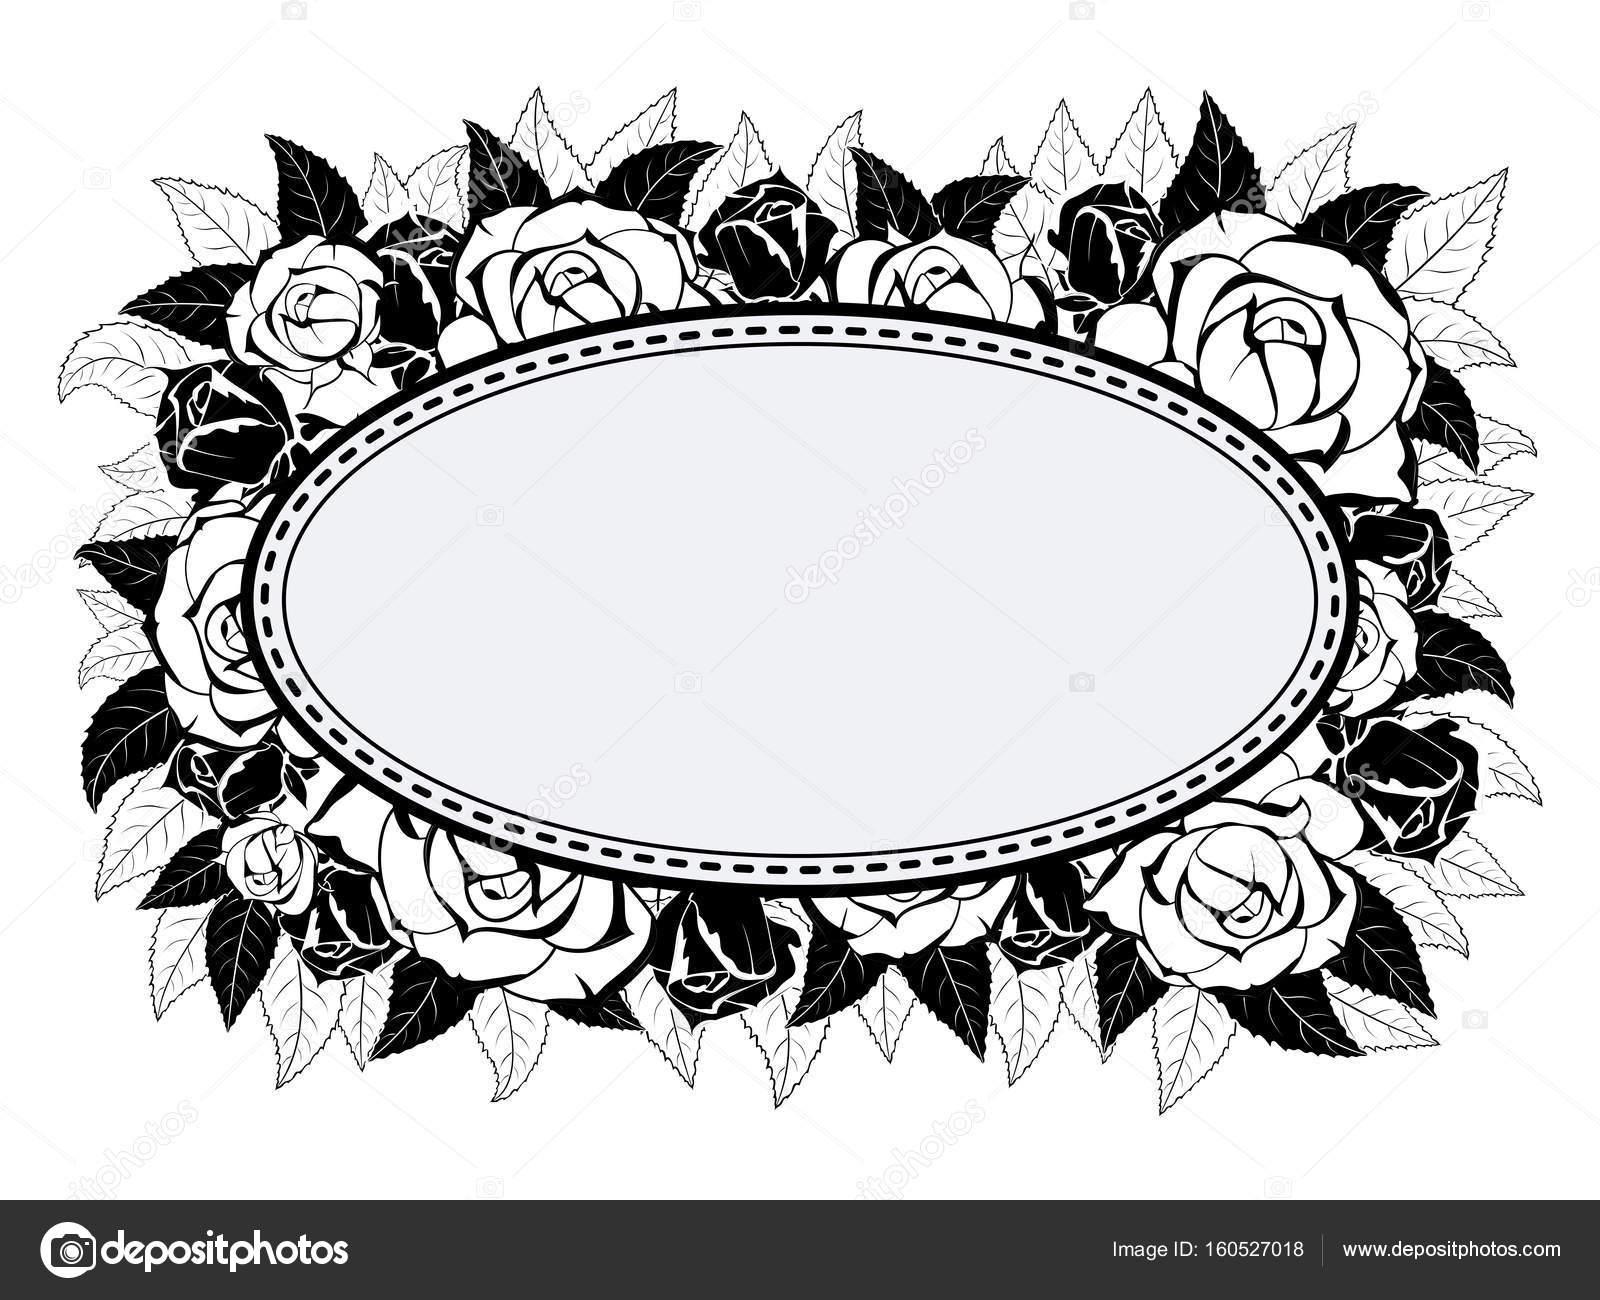 Rahmen für Gratulation mit Rosen — Stockvektor © Pavel.A.V. #160527018